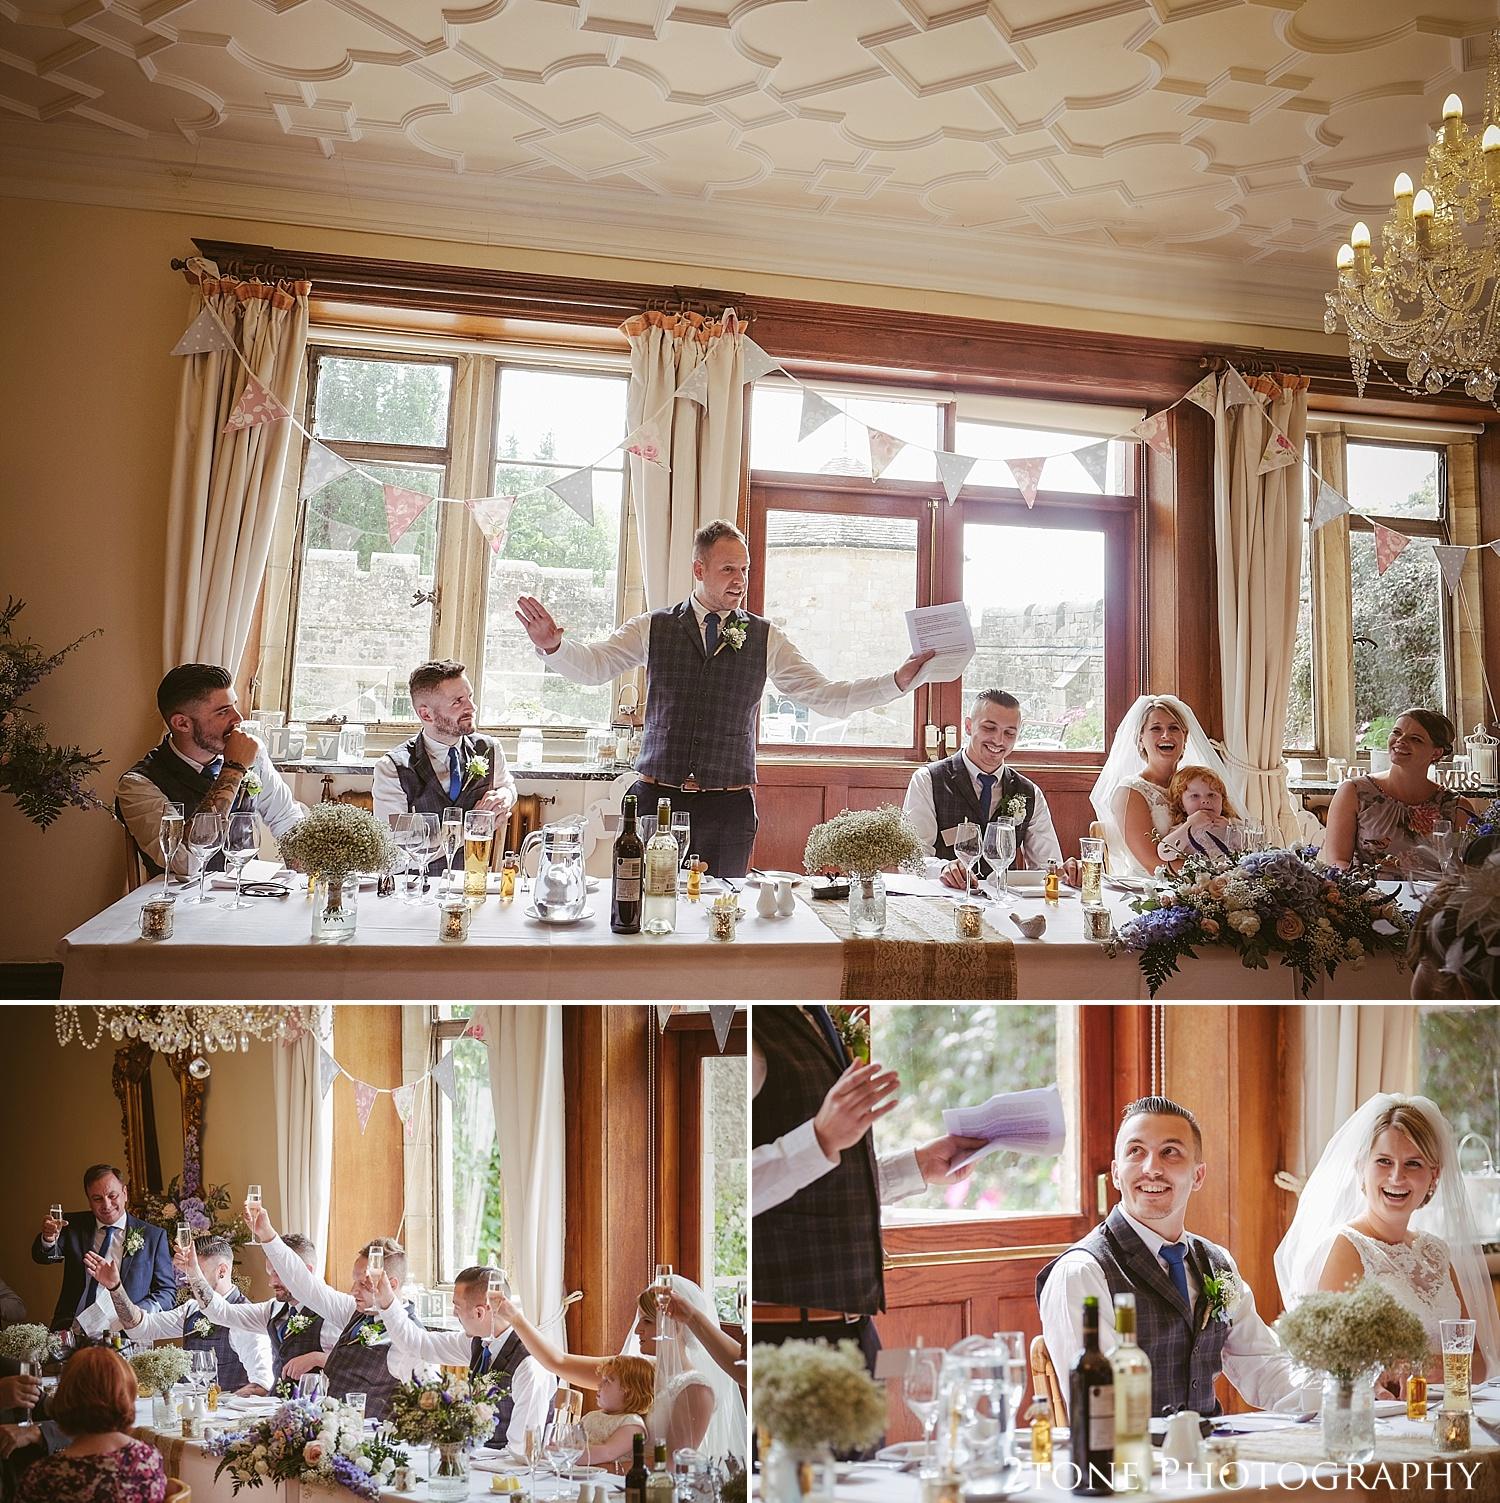 Wedding photography speeches.  Wedding photography at Guyzance Hall by wedding photographers www.2tonephotography.co.uk